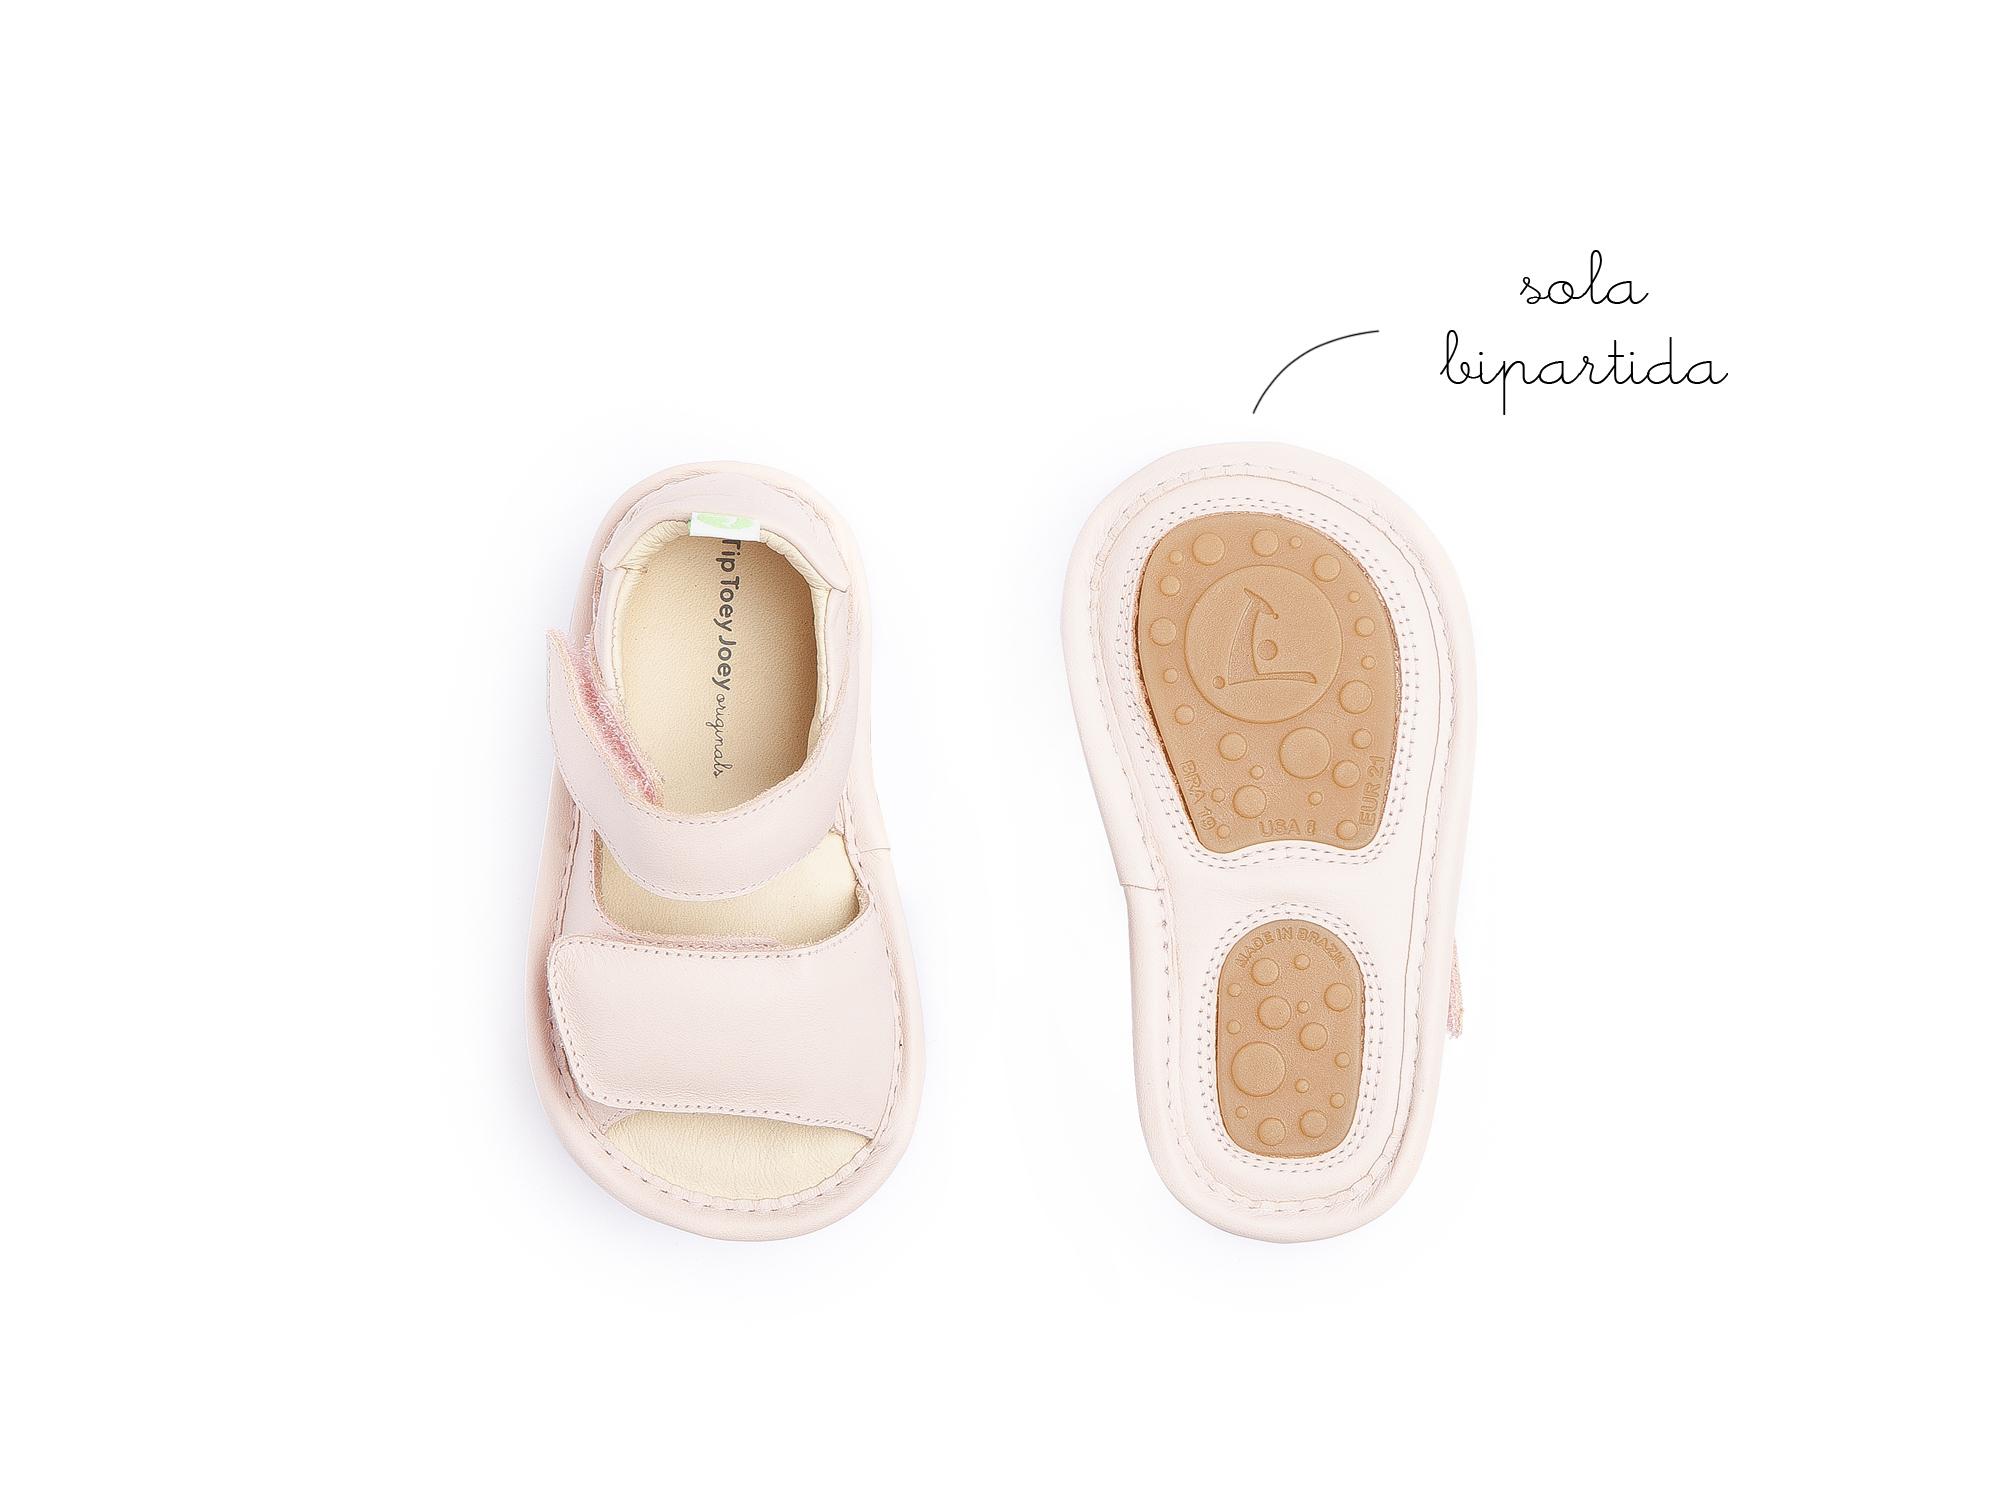 Sandália Toey Cotton Candy Baby 0 à 2 anos - 1